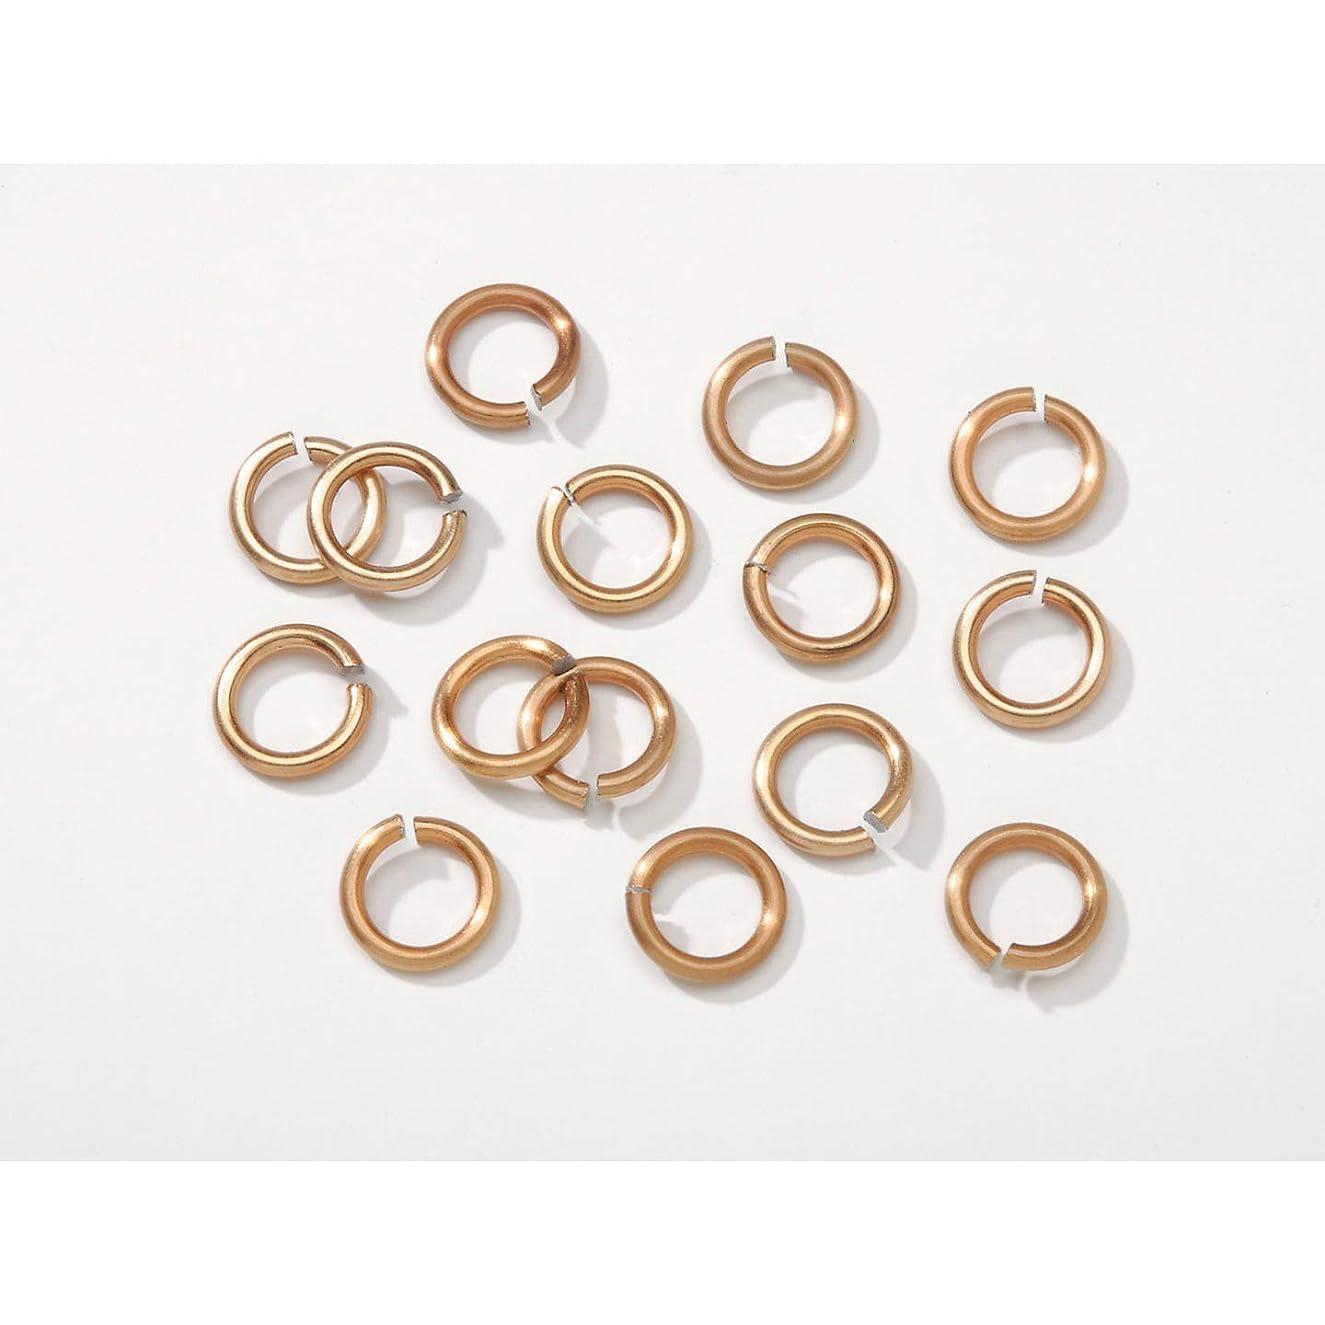 Bulk Buy: Darice DIY Crafts Chain Maille Aluminum Jump Rings Gold 10mm (4-Pack) BG1017